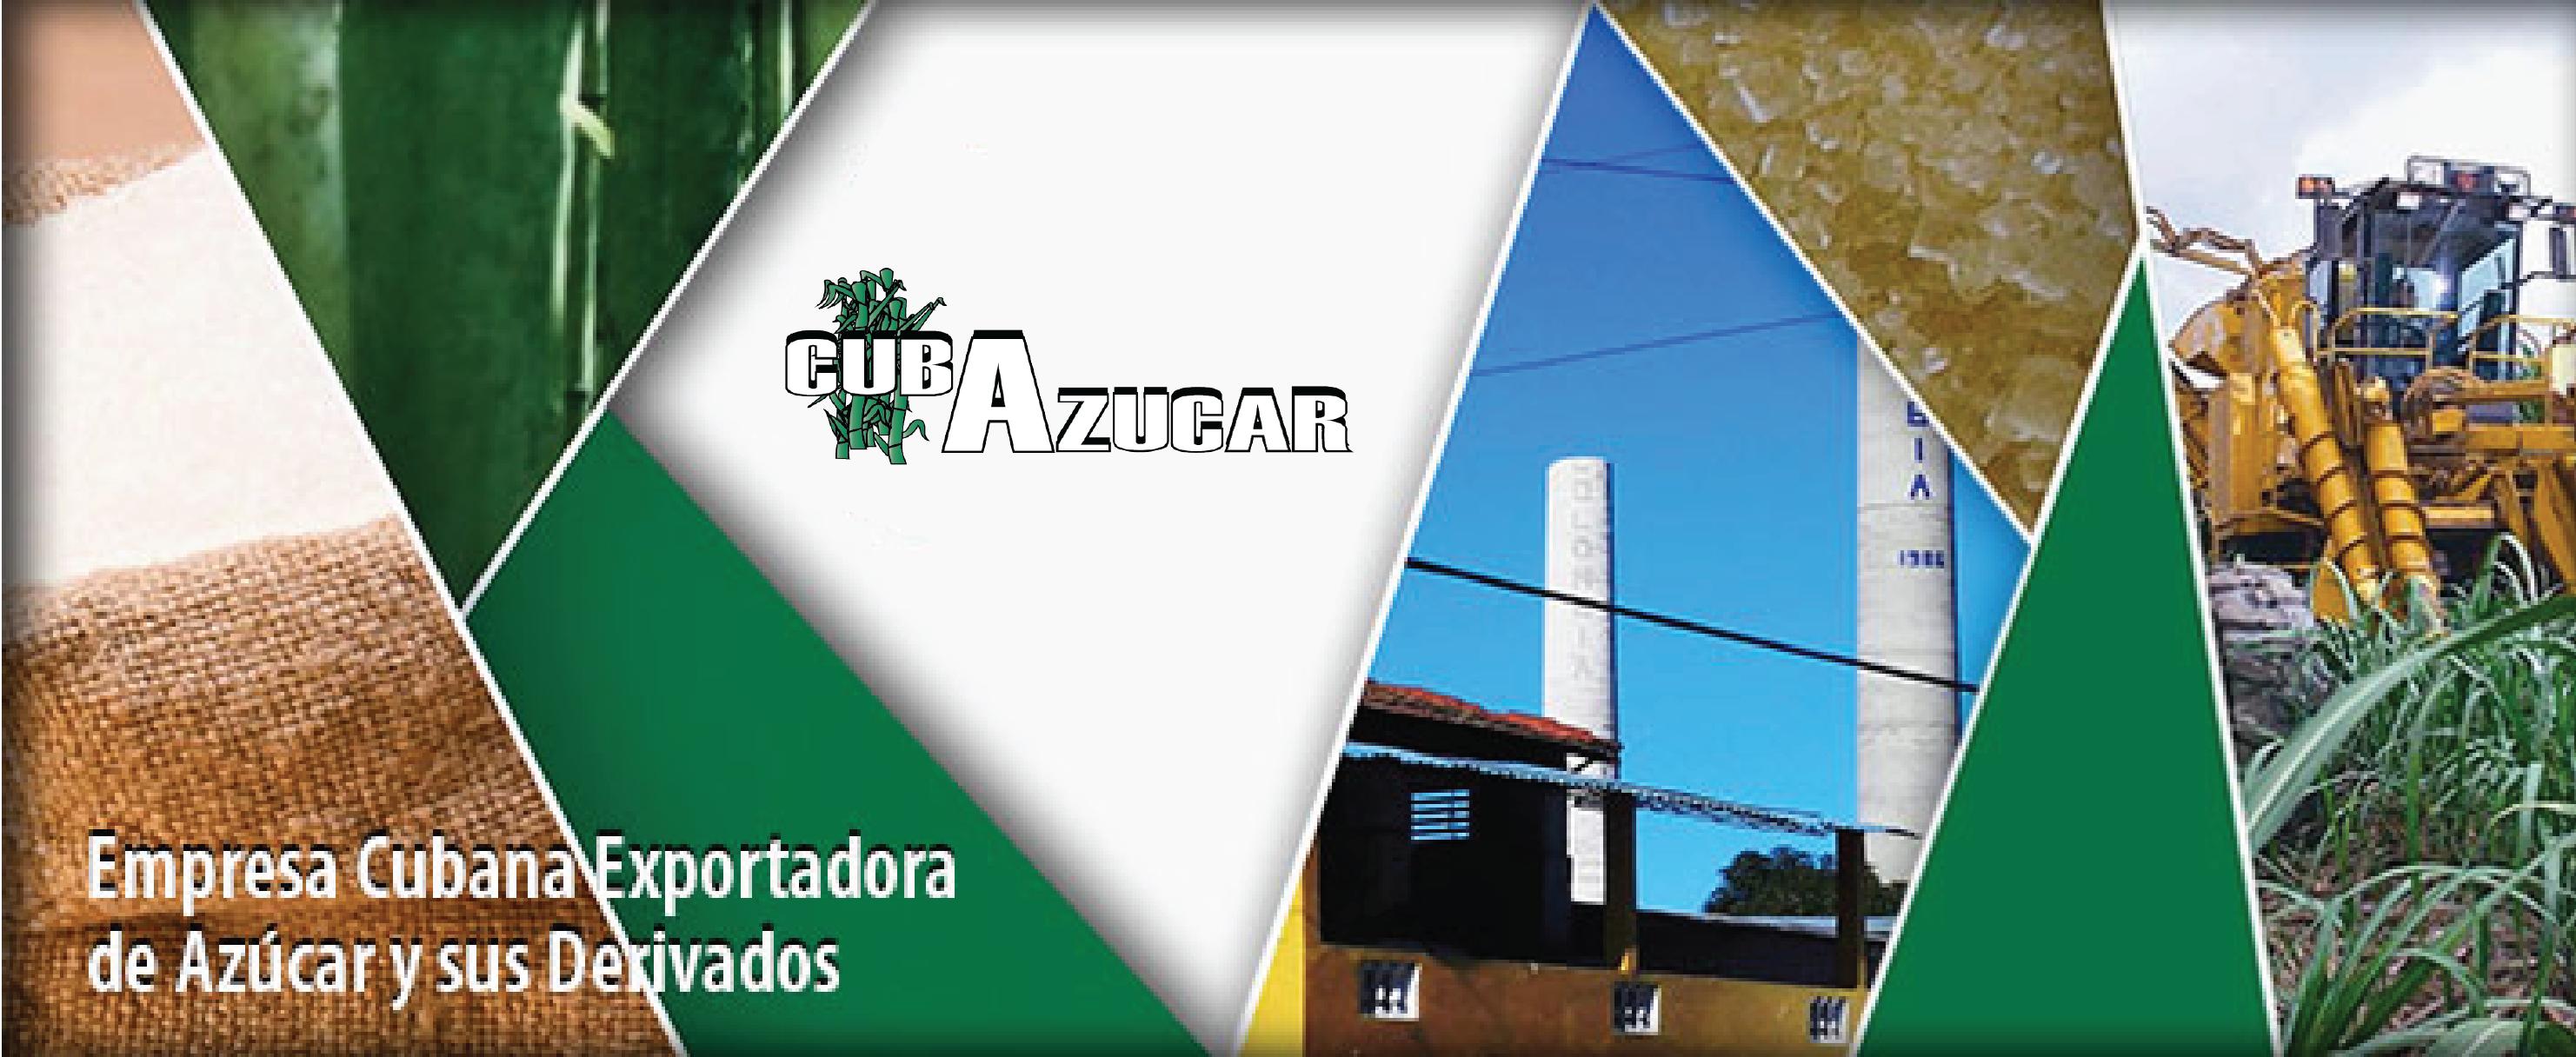 Cuban Exporting Company of Sugar and its Derivatives in Cuba